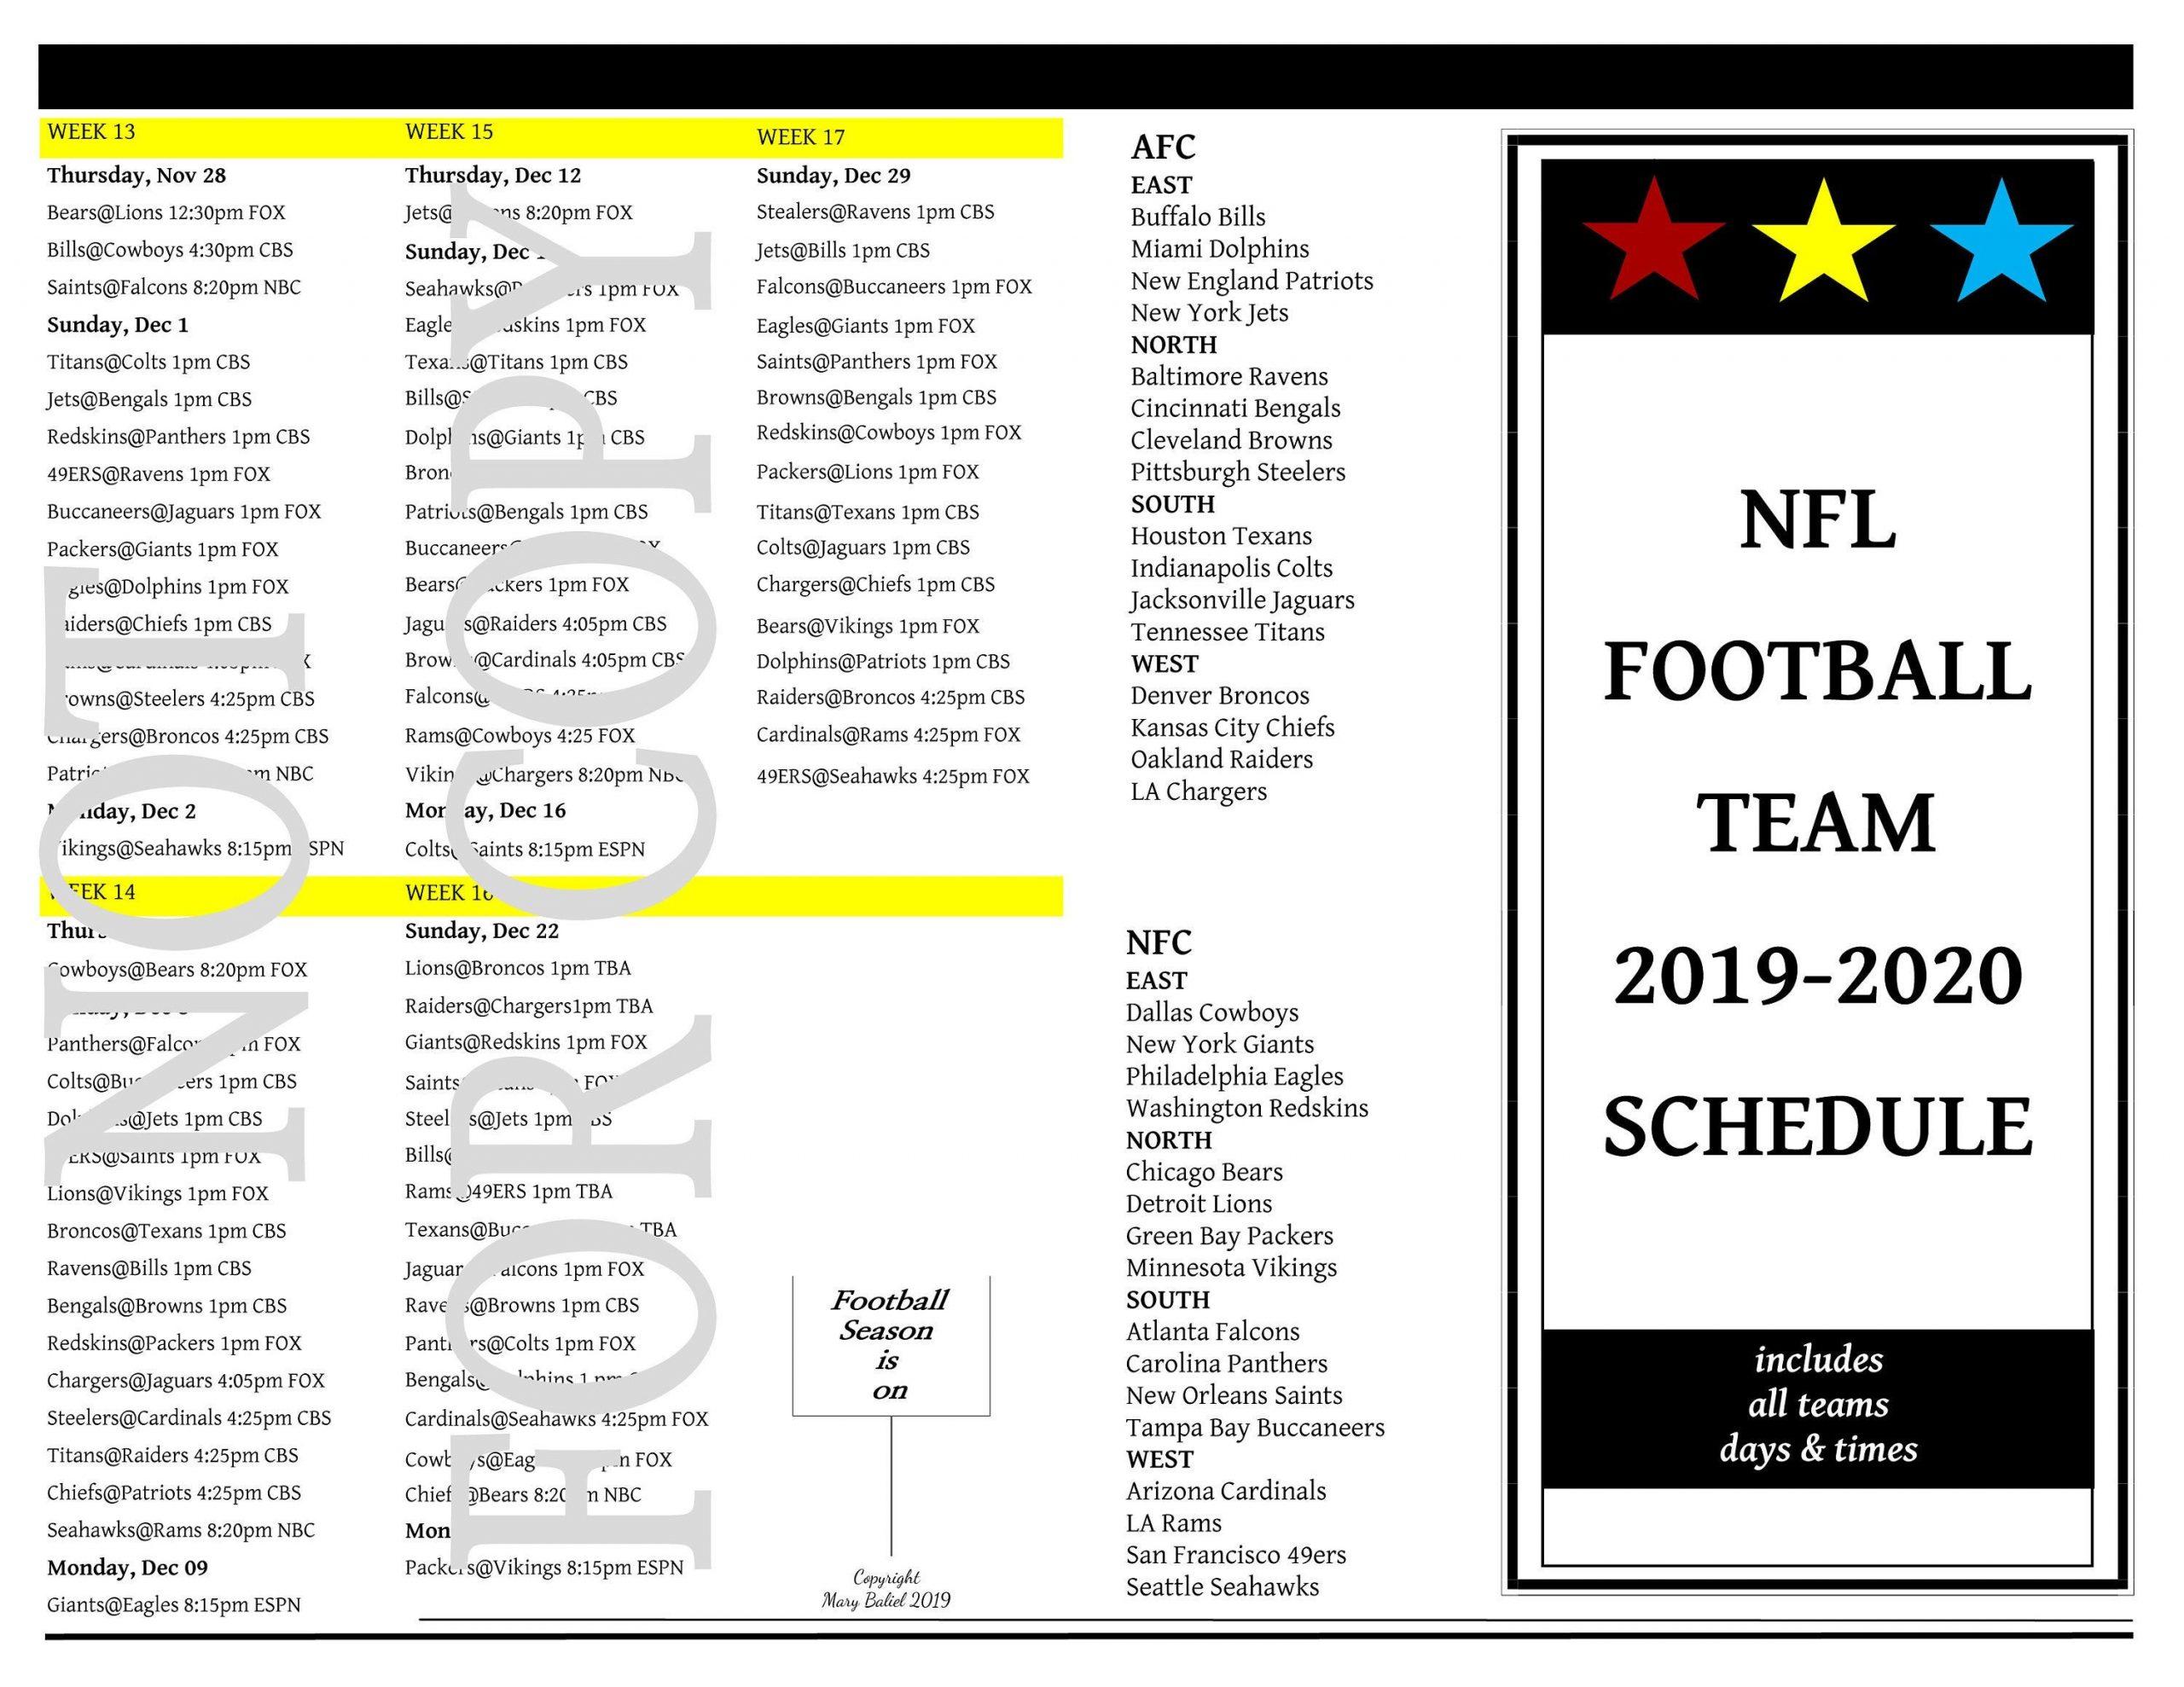 Nfl Custom 2019-2020 Football Schedule | Nfl Football